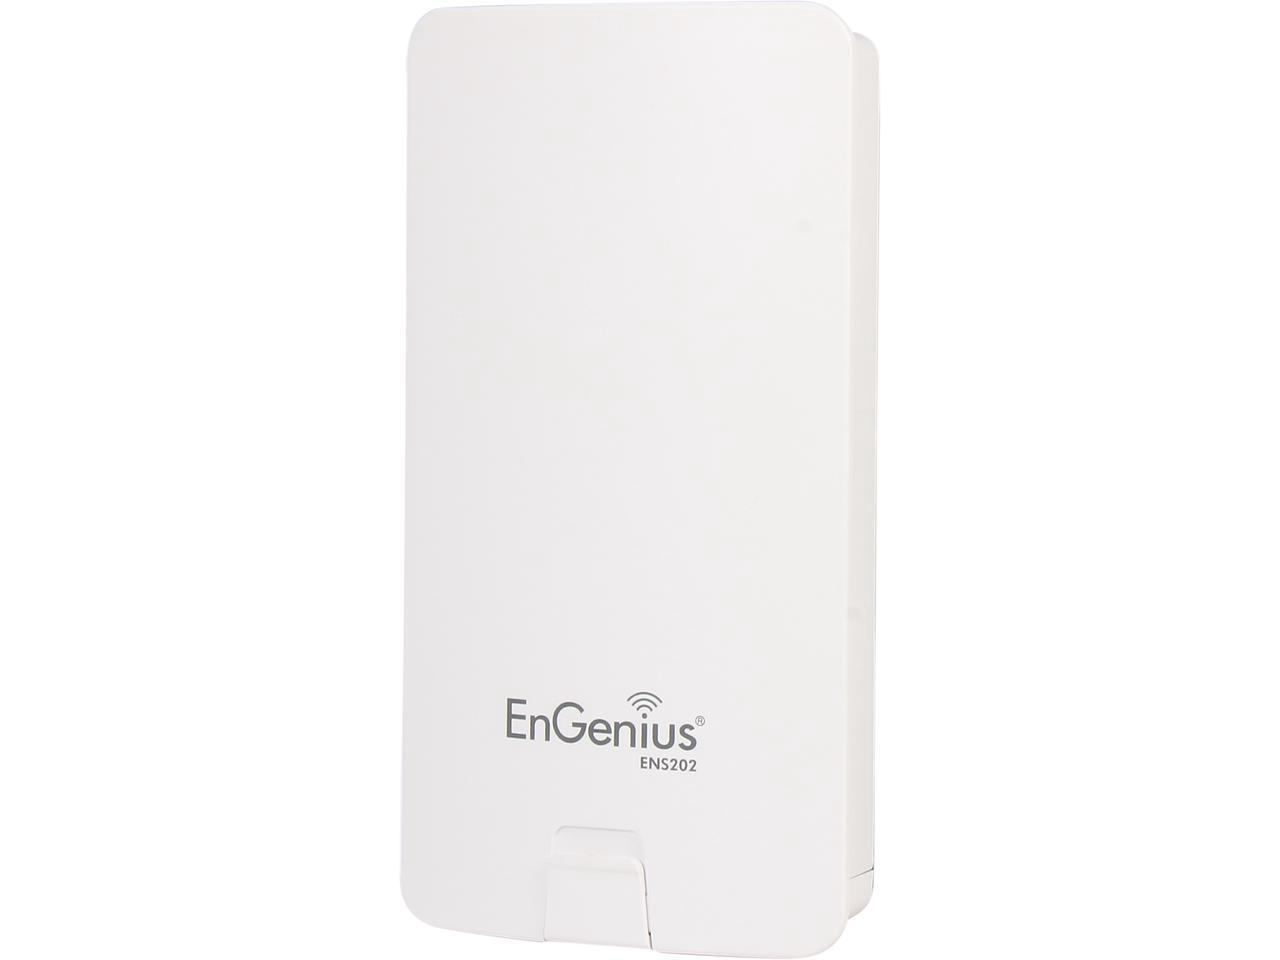 EnGenius ENS202 N300 Long-Range 2.4 GHz Outdoor Wireless Bridge / Access Point